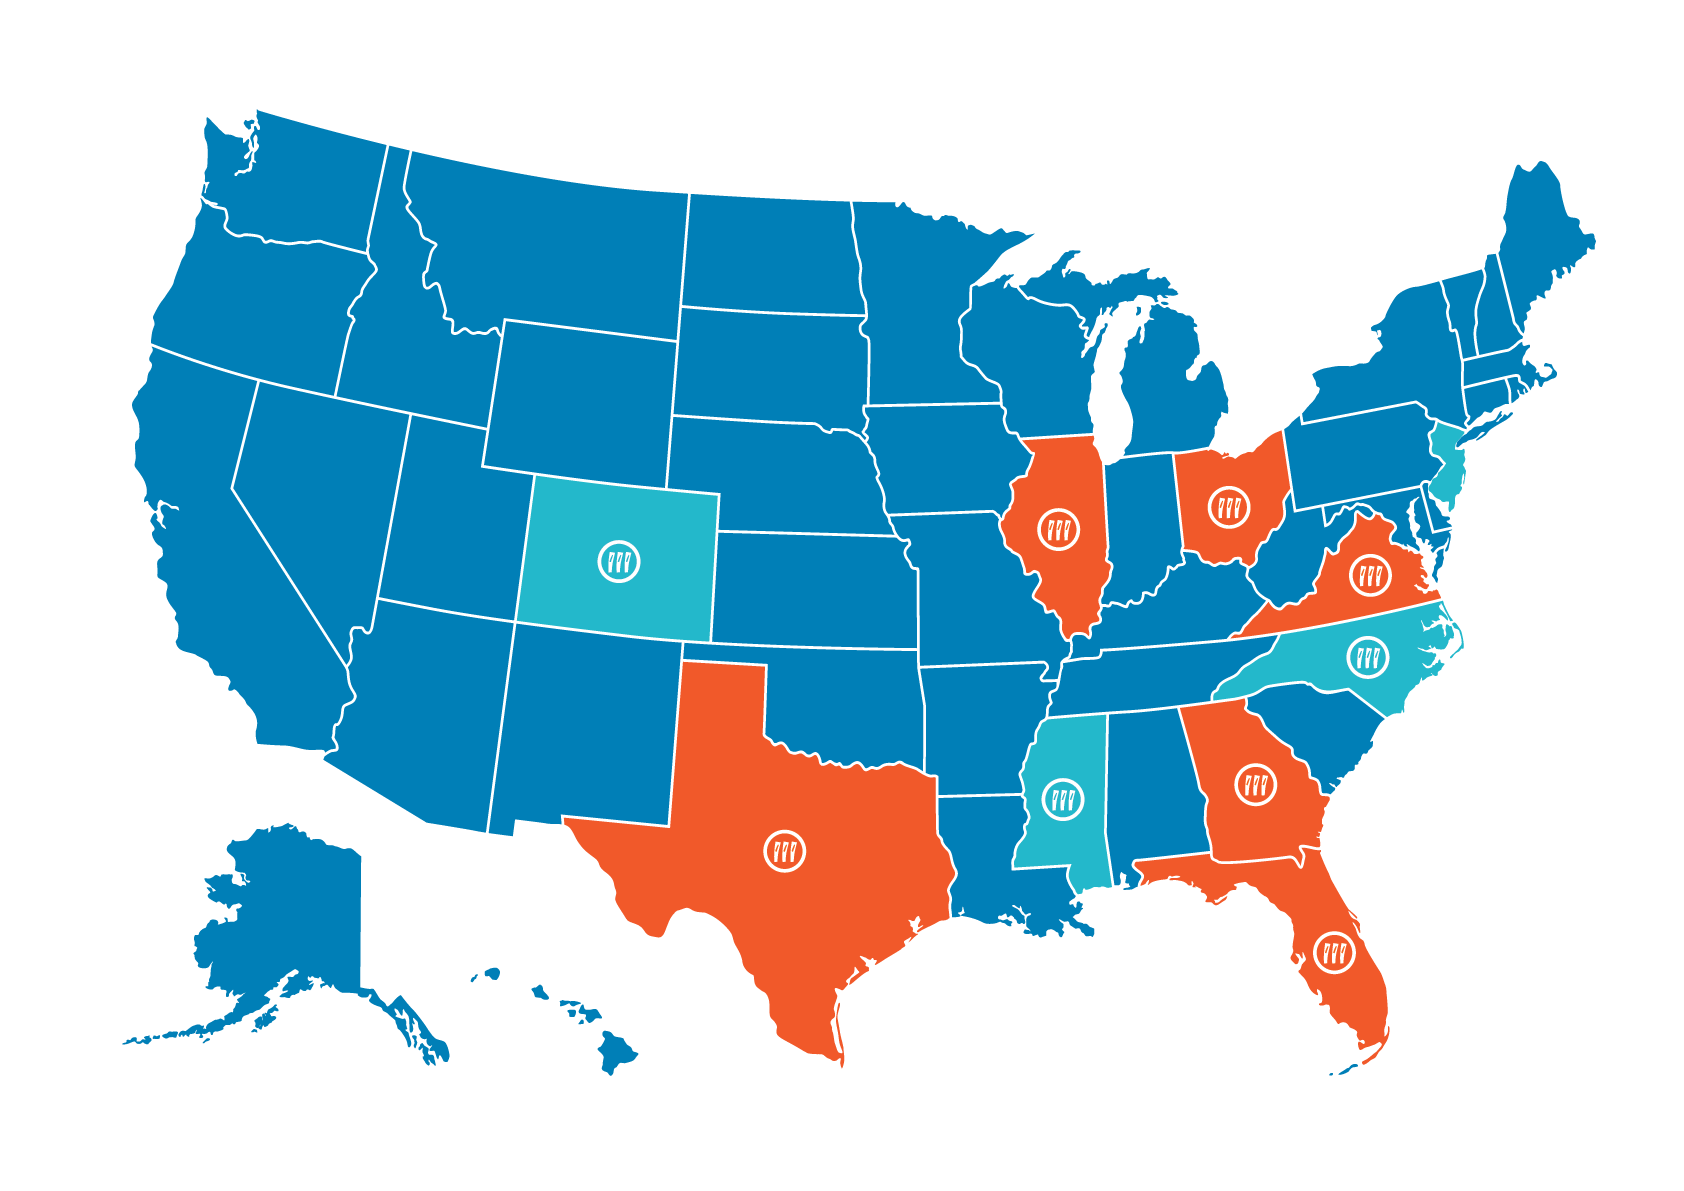 Map of Segue Projects- Dec 2017